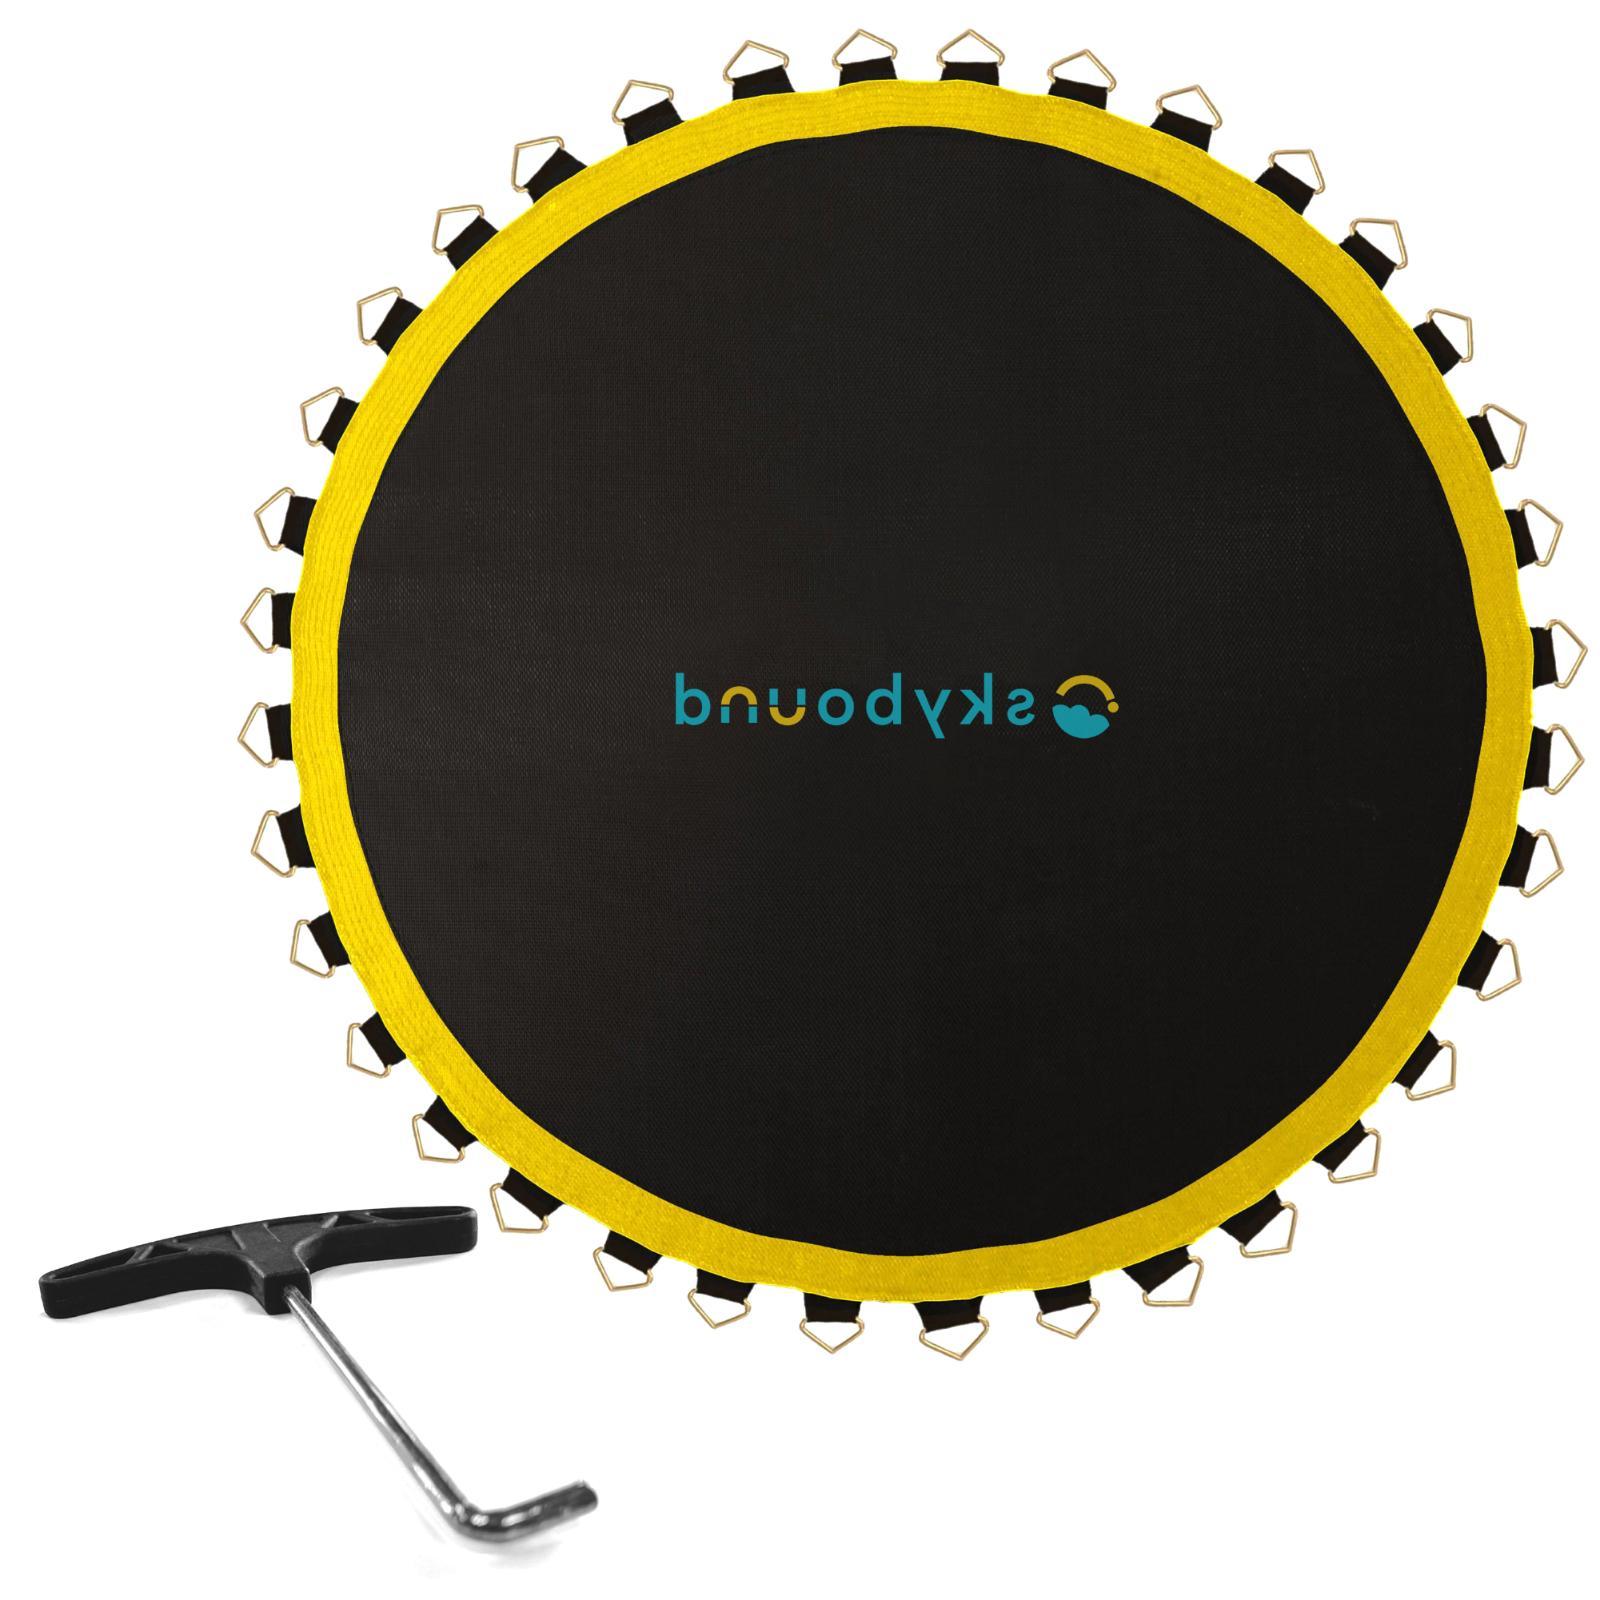 premium trampoline mat w sunguard 12 14